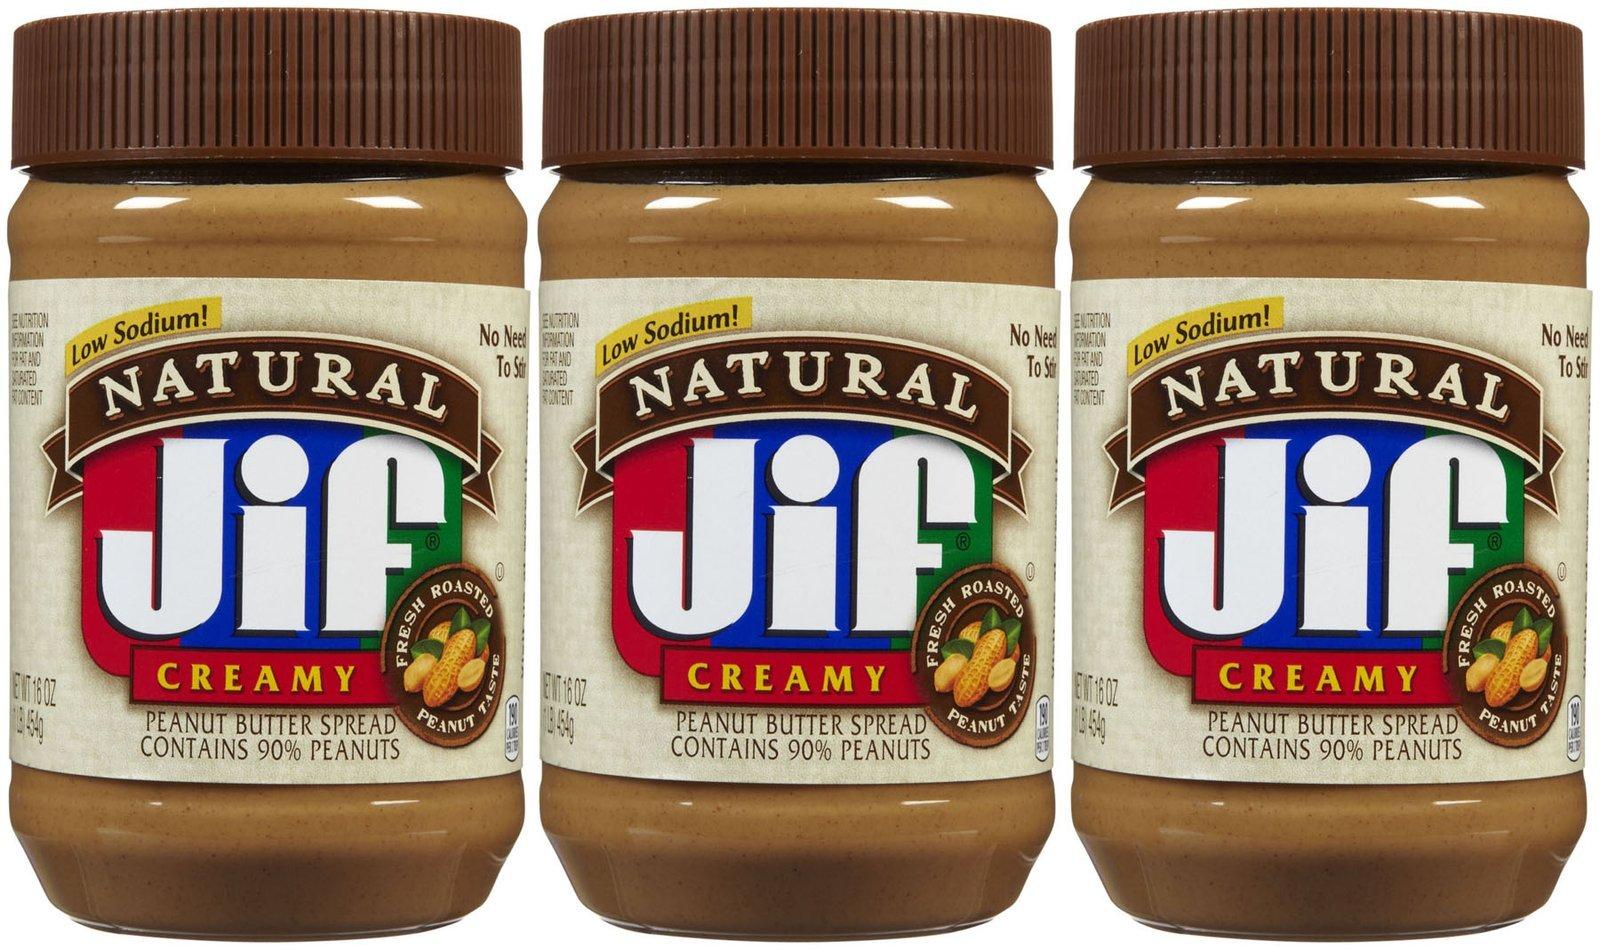 Jif Natural Creamy Peanut Butter, 16 oz, 3 ct by Jif